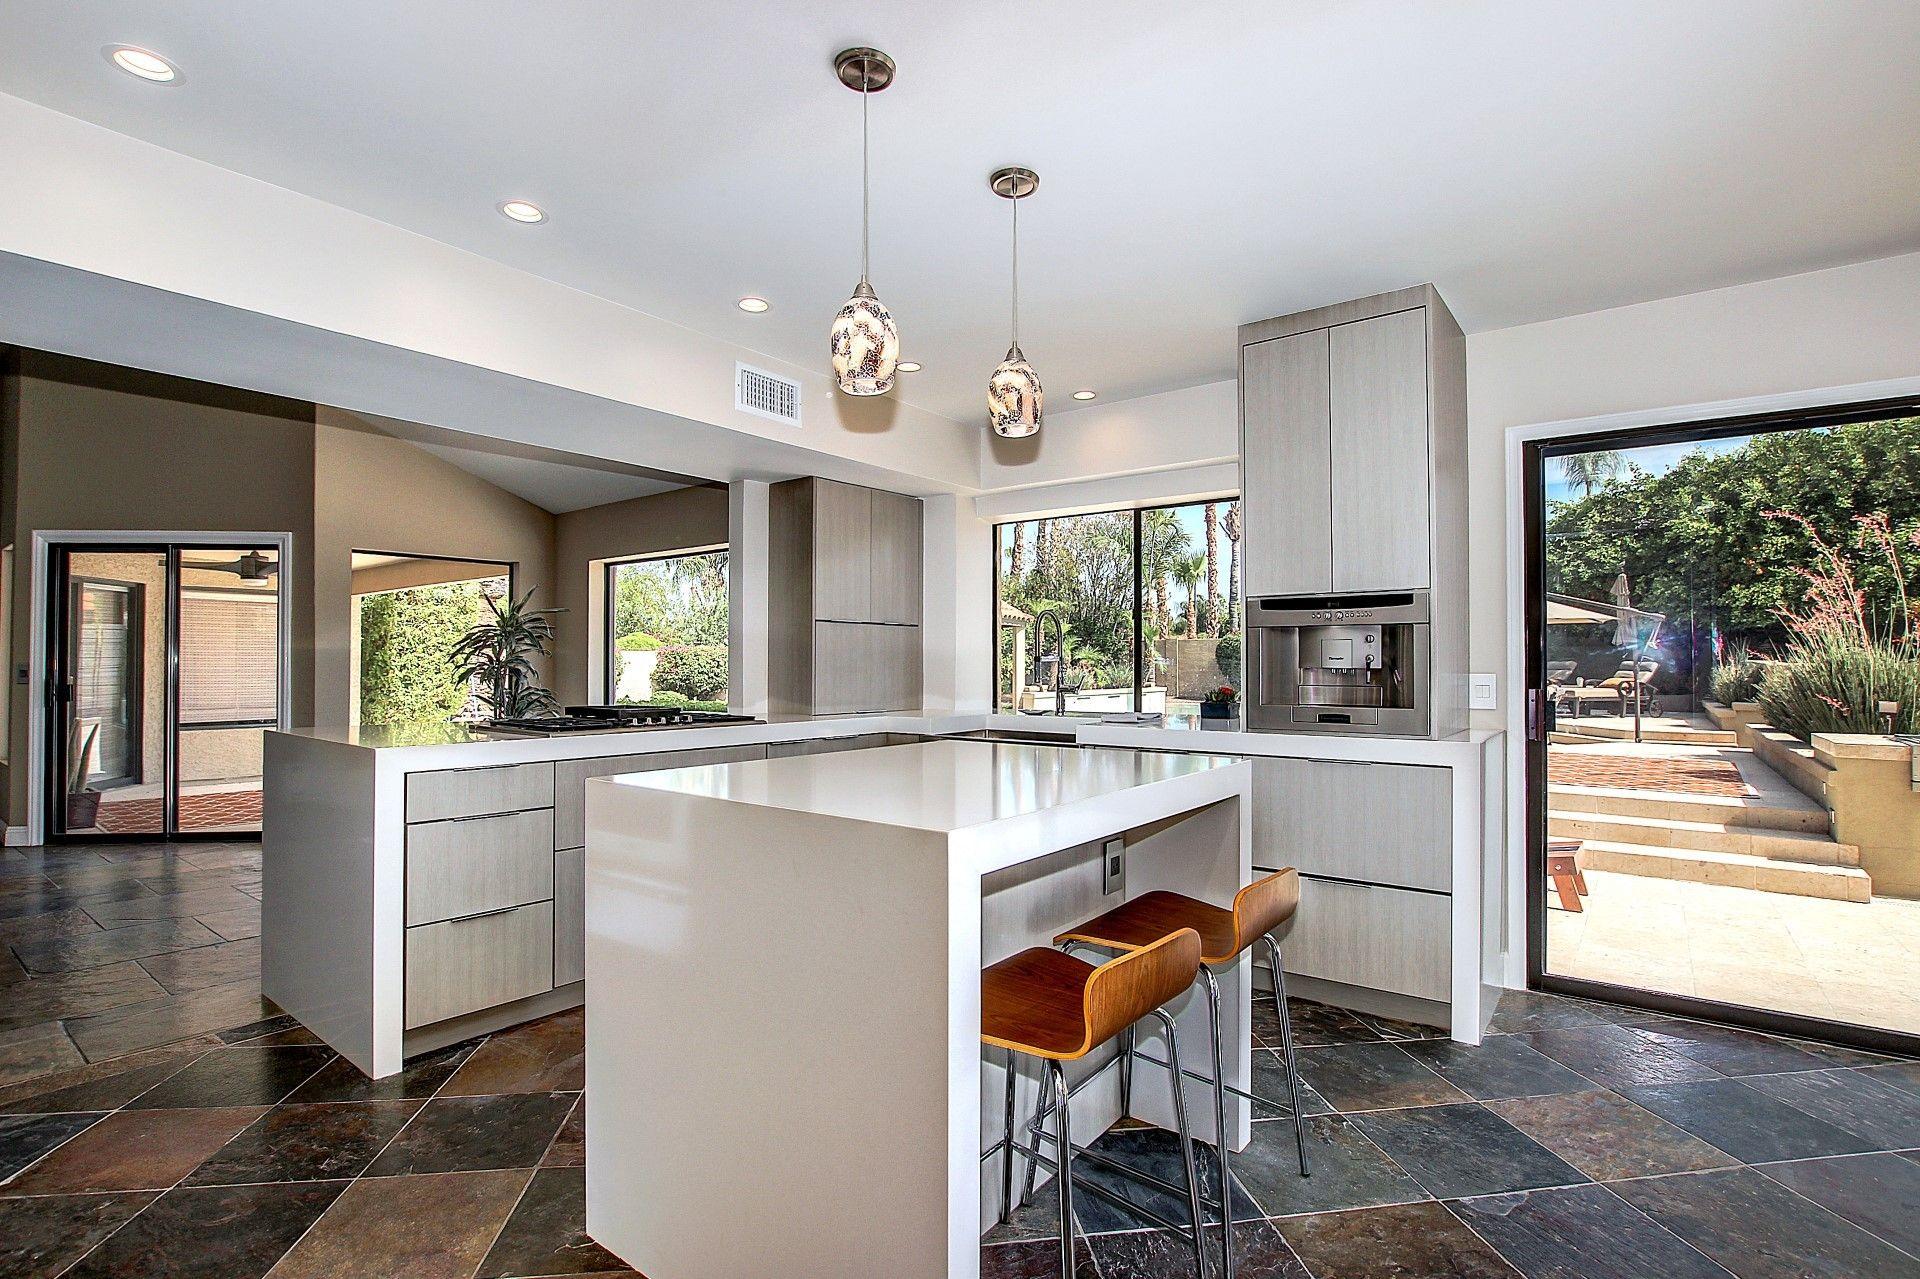 Scottsdale, AZ Modern Kitchen Remodel   Good Guys Remodeling LLC